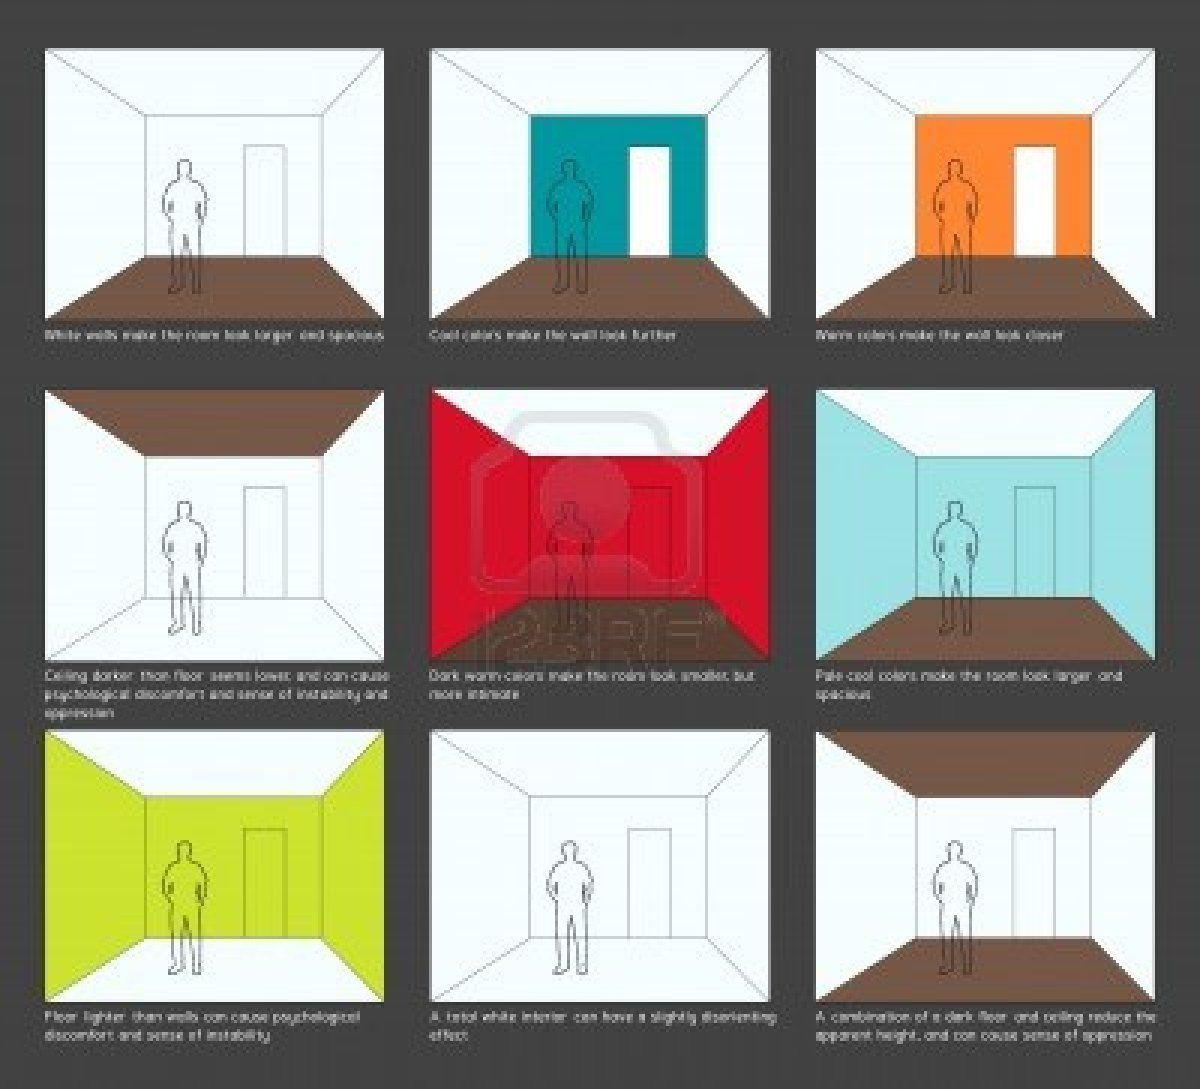 Home Decoration Interior Design Basics Color Scheme And Space Interior Design Basics Design Basics Color Palette Interior Design